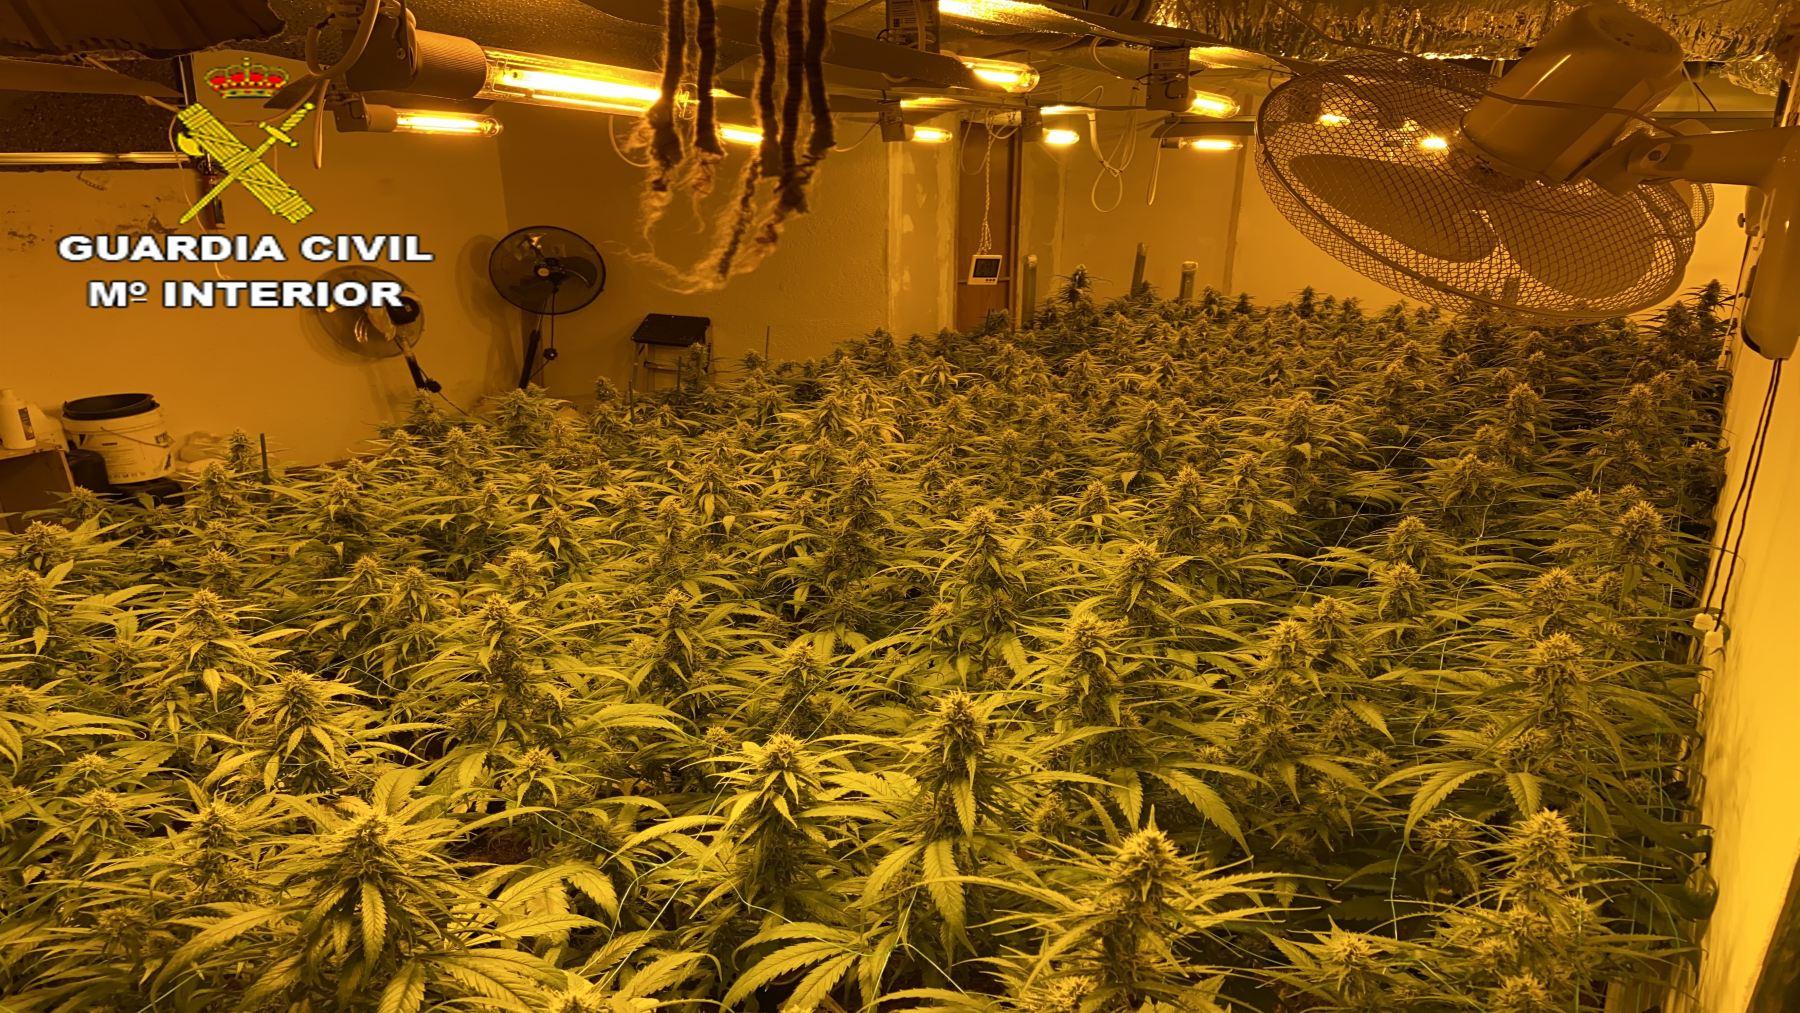 Cultivo ilegal de marihuana (GUARDIA CIVIL).